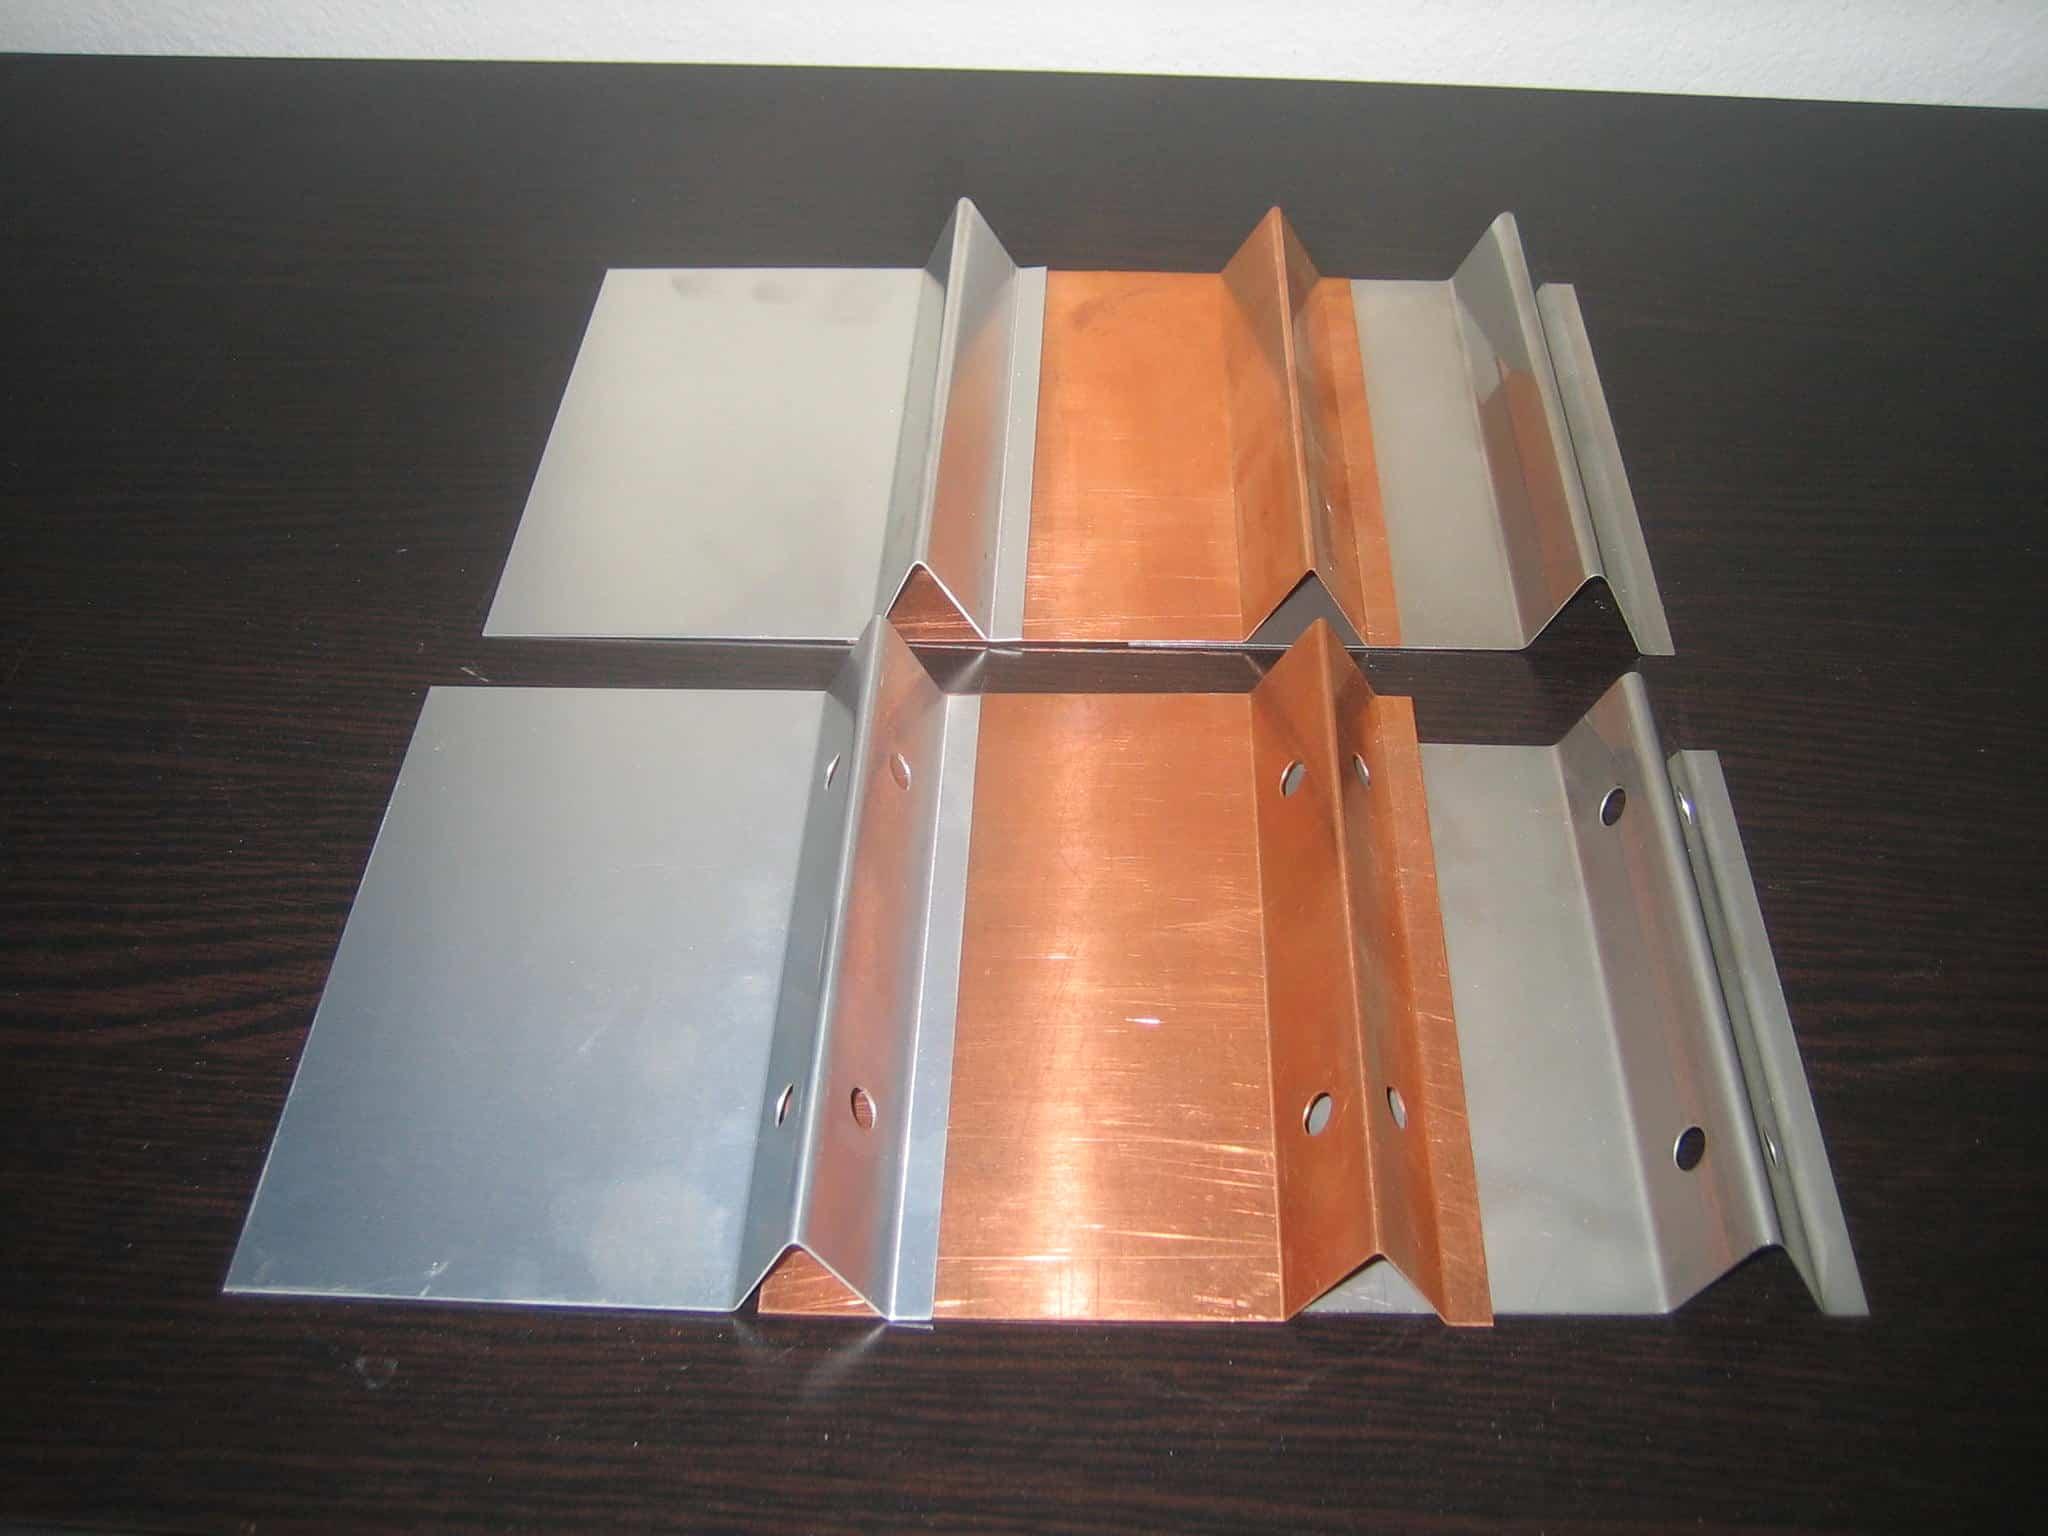 fha weep screed aluminum stainless steel copper.jpg